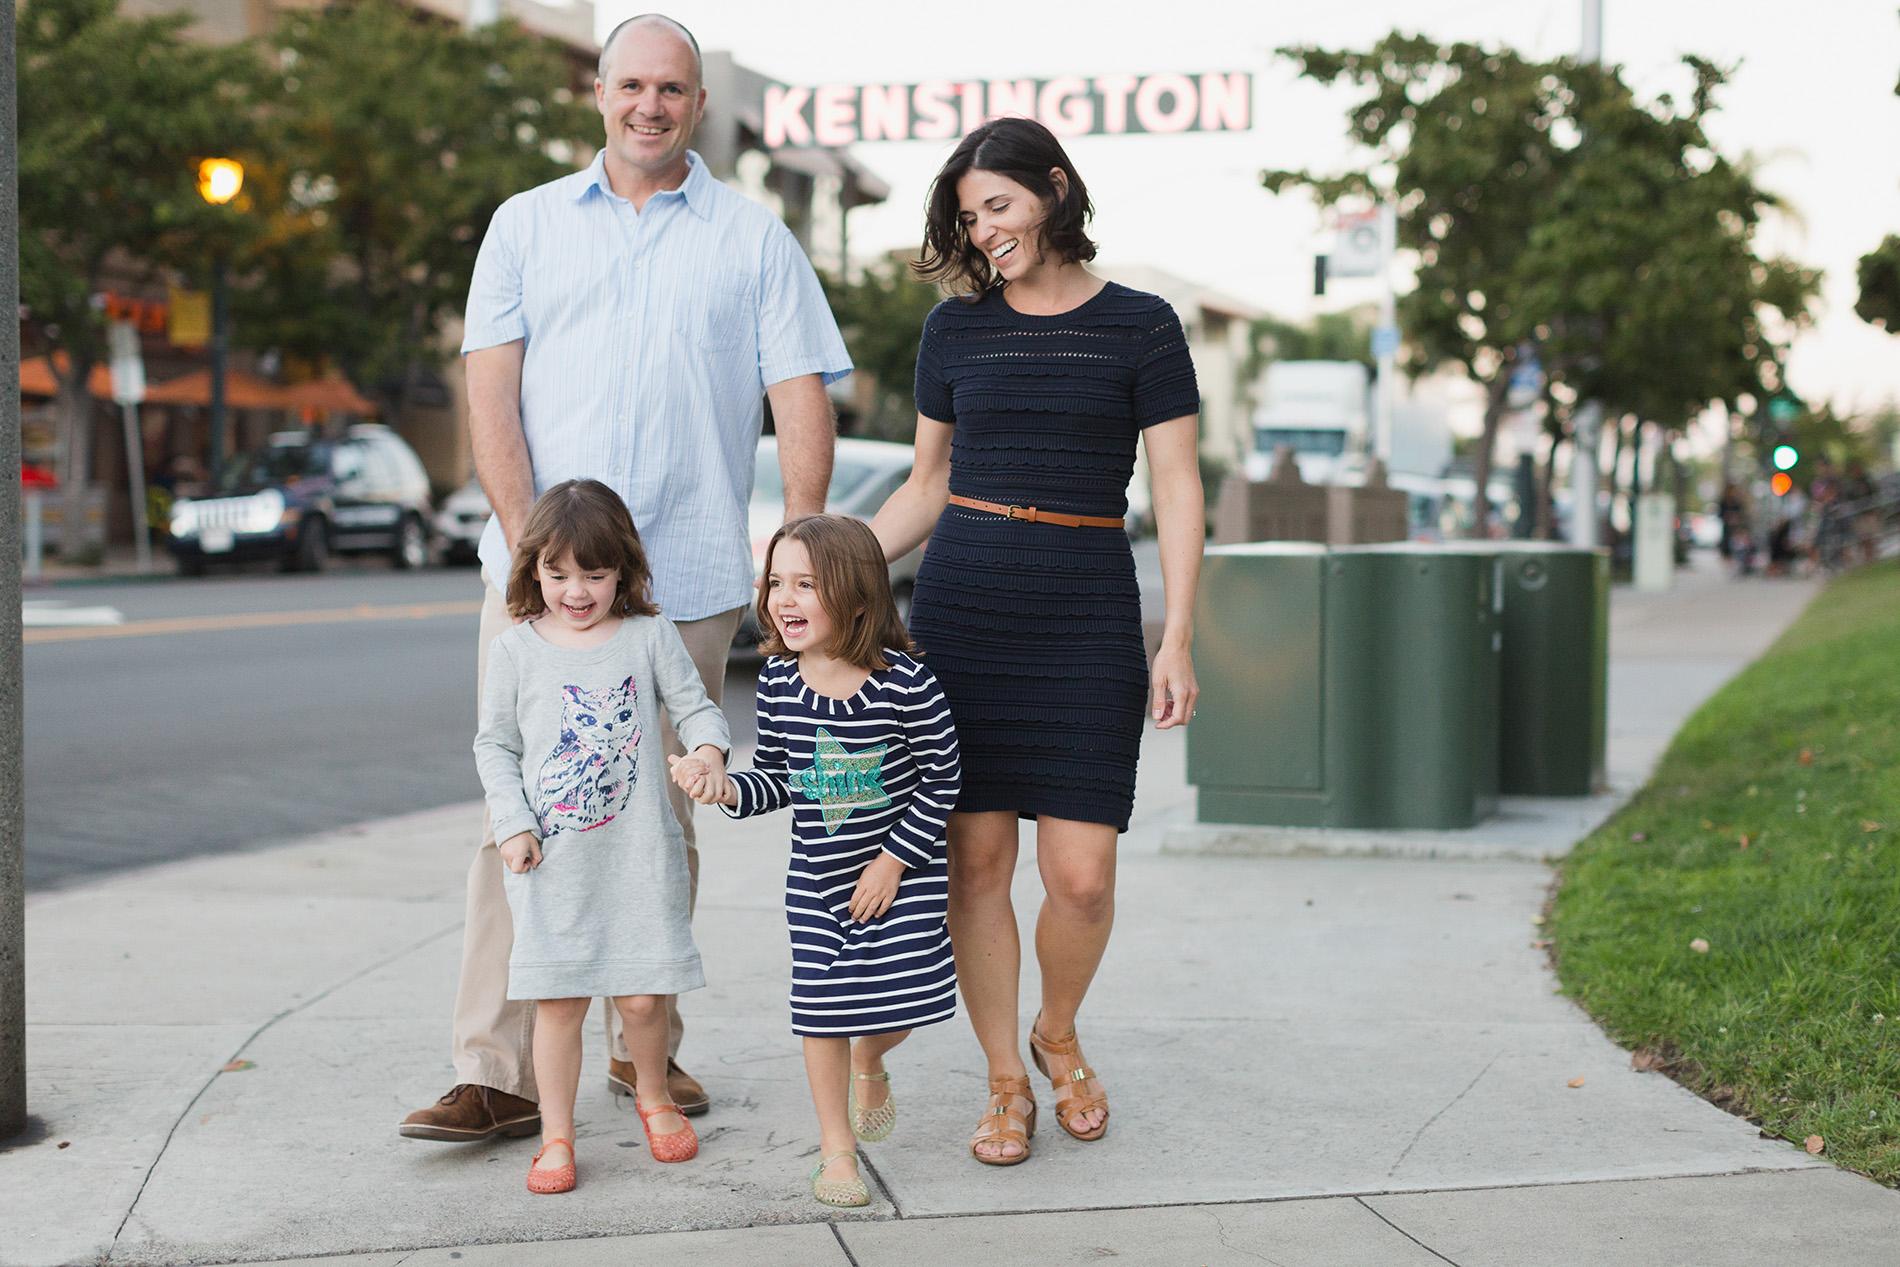 San Diego Lifestyle Family Photographer Christine Dammann Photography Kensington-28.jpg